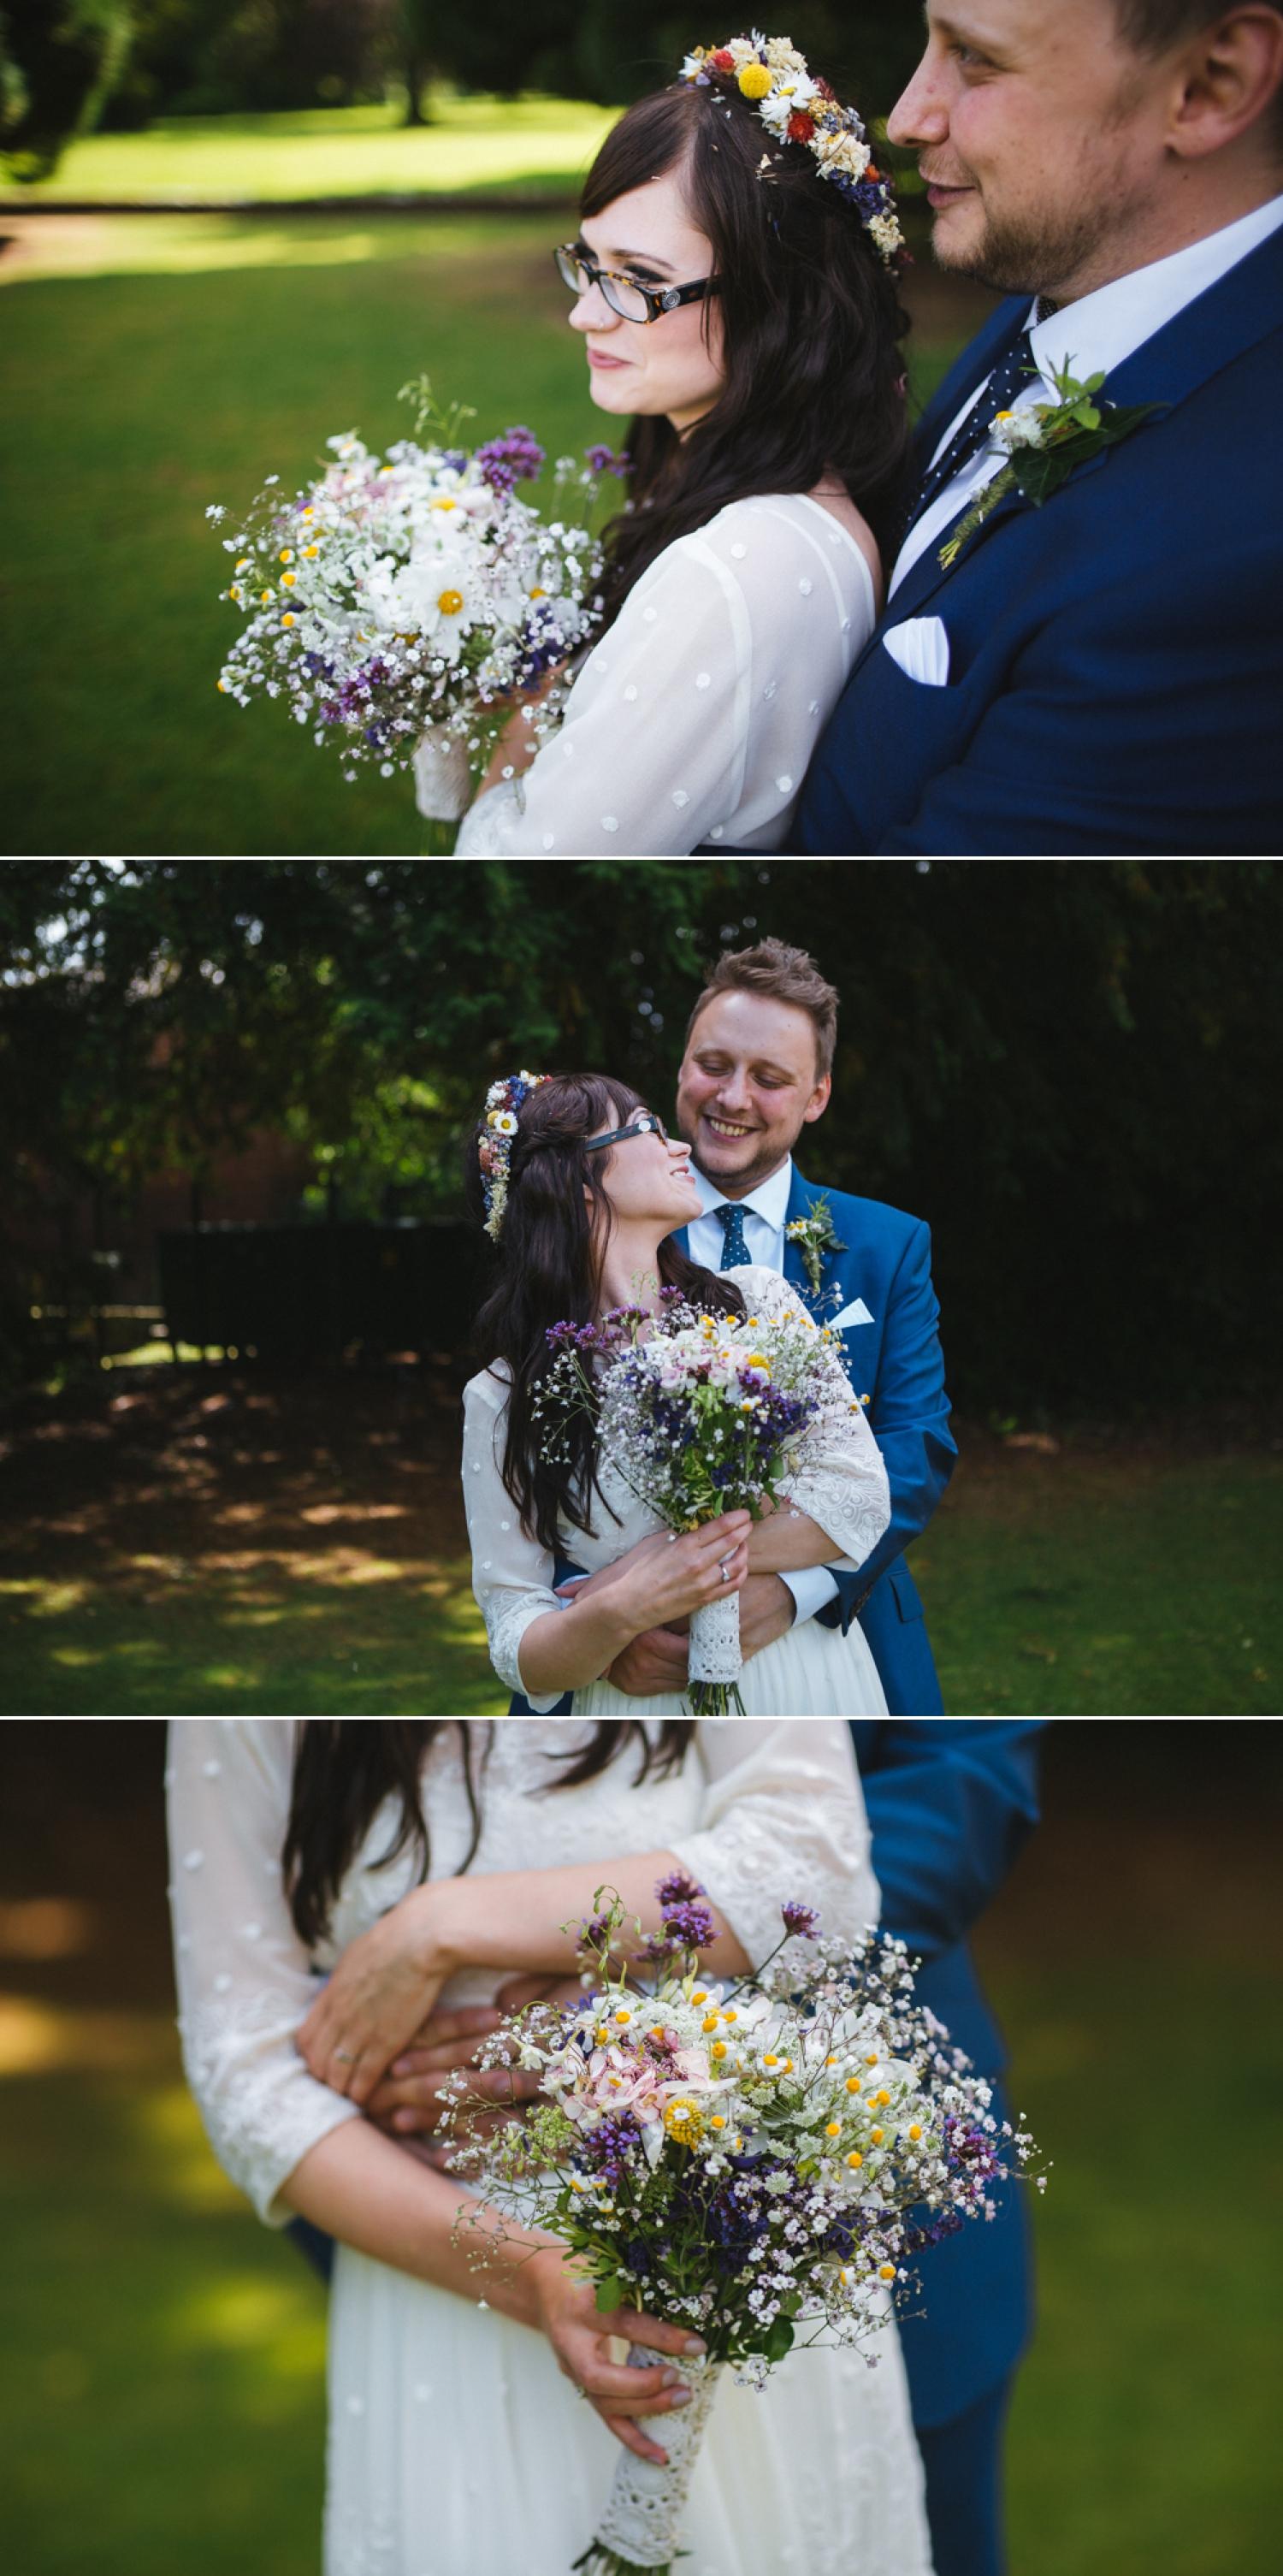 Cheshire Wedding Photographer Elly & Liam_0020